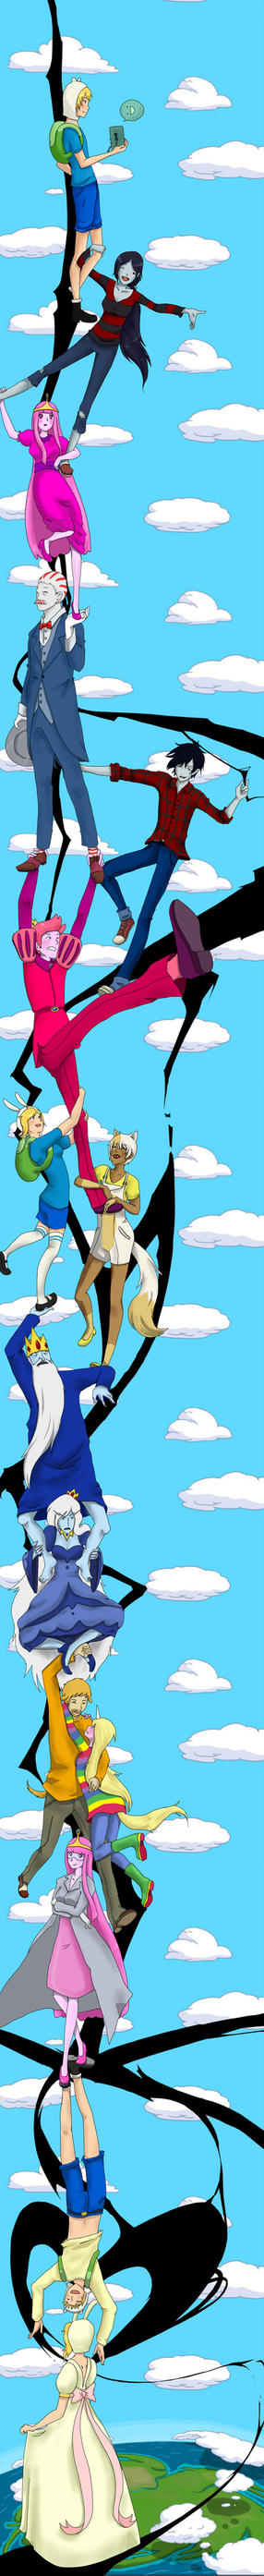 Adventure Time: Trust Me by KirscheAnder